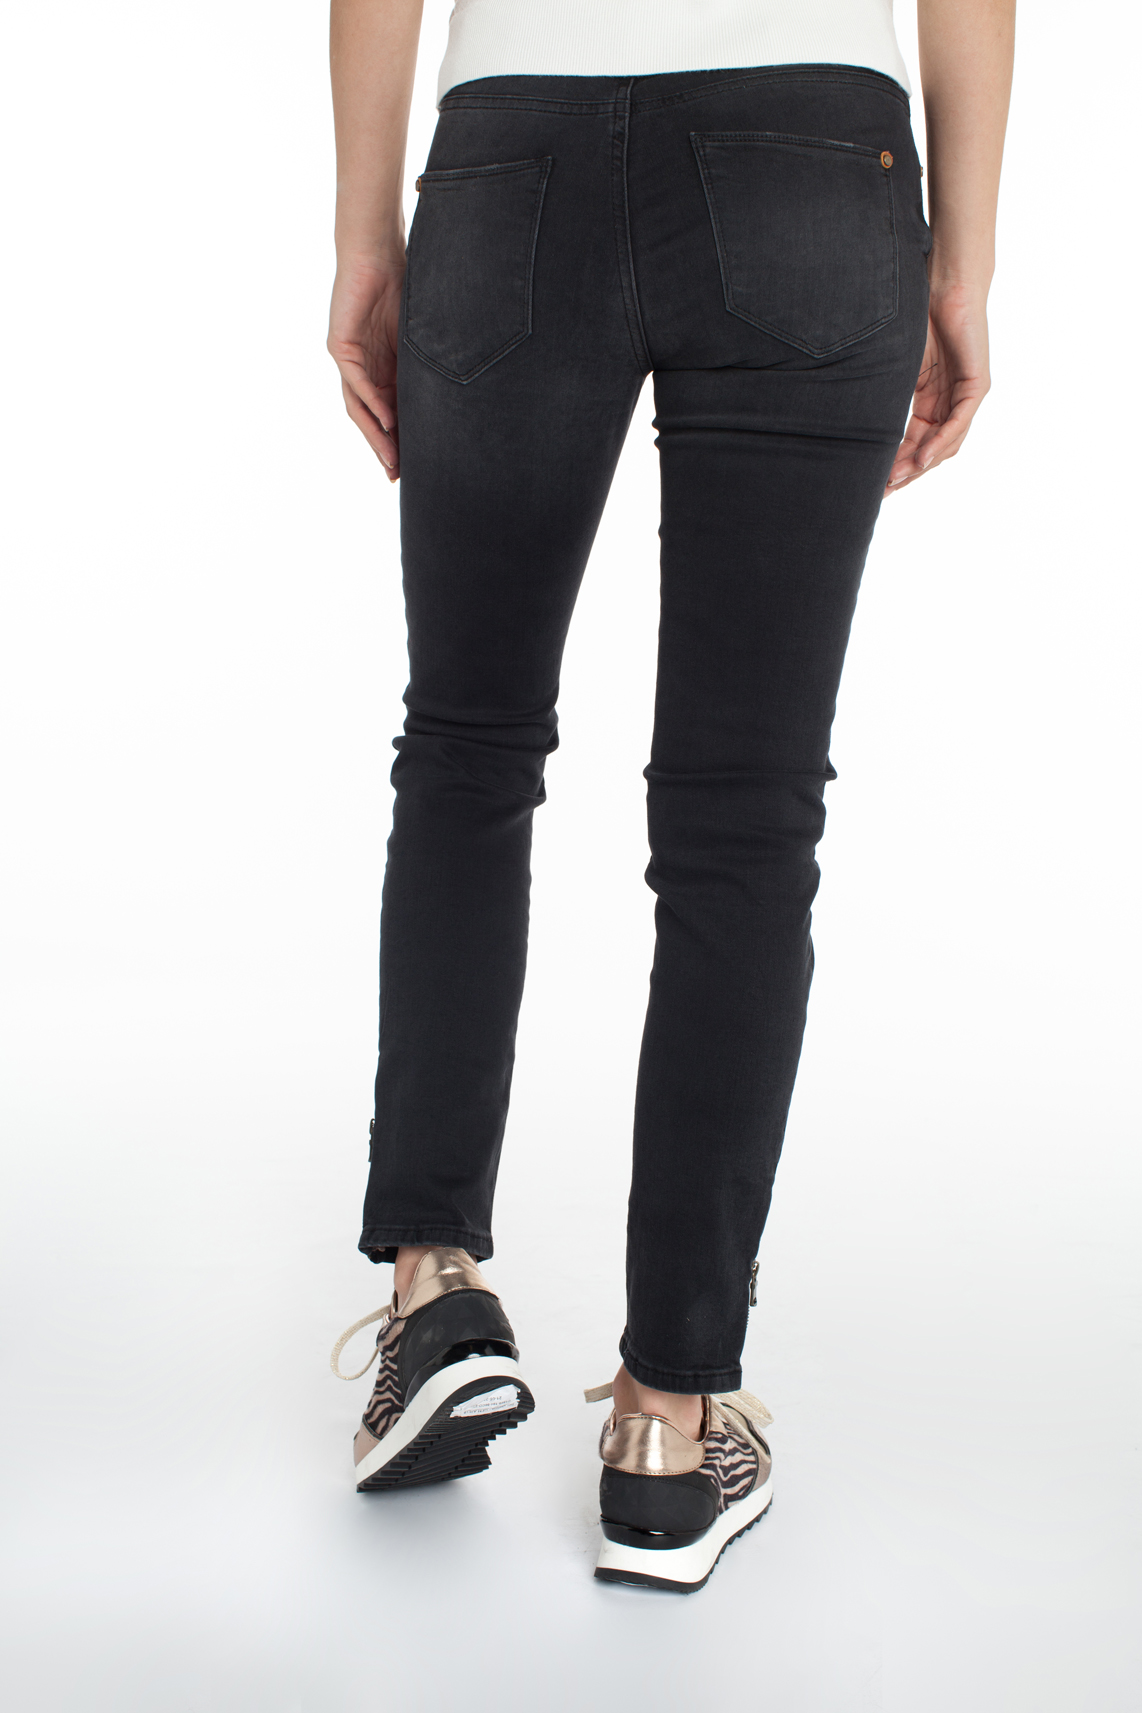 Mos Mosh Dames Victoria jeans Blauw